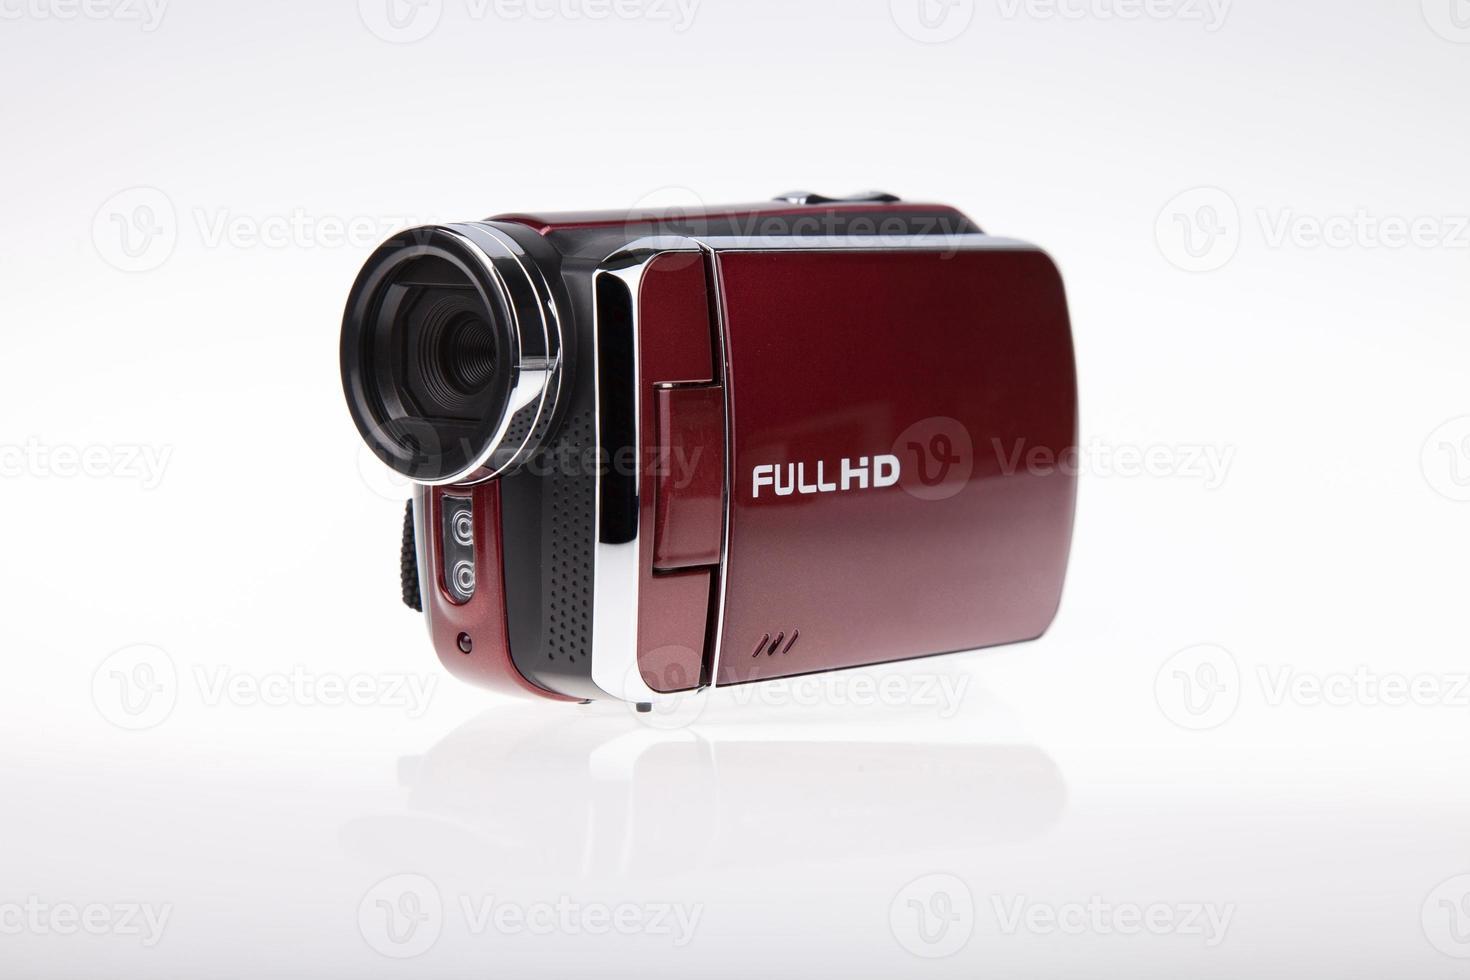 filmadora de vídeo full hd - imagem de stock foto